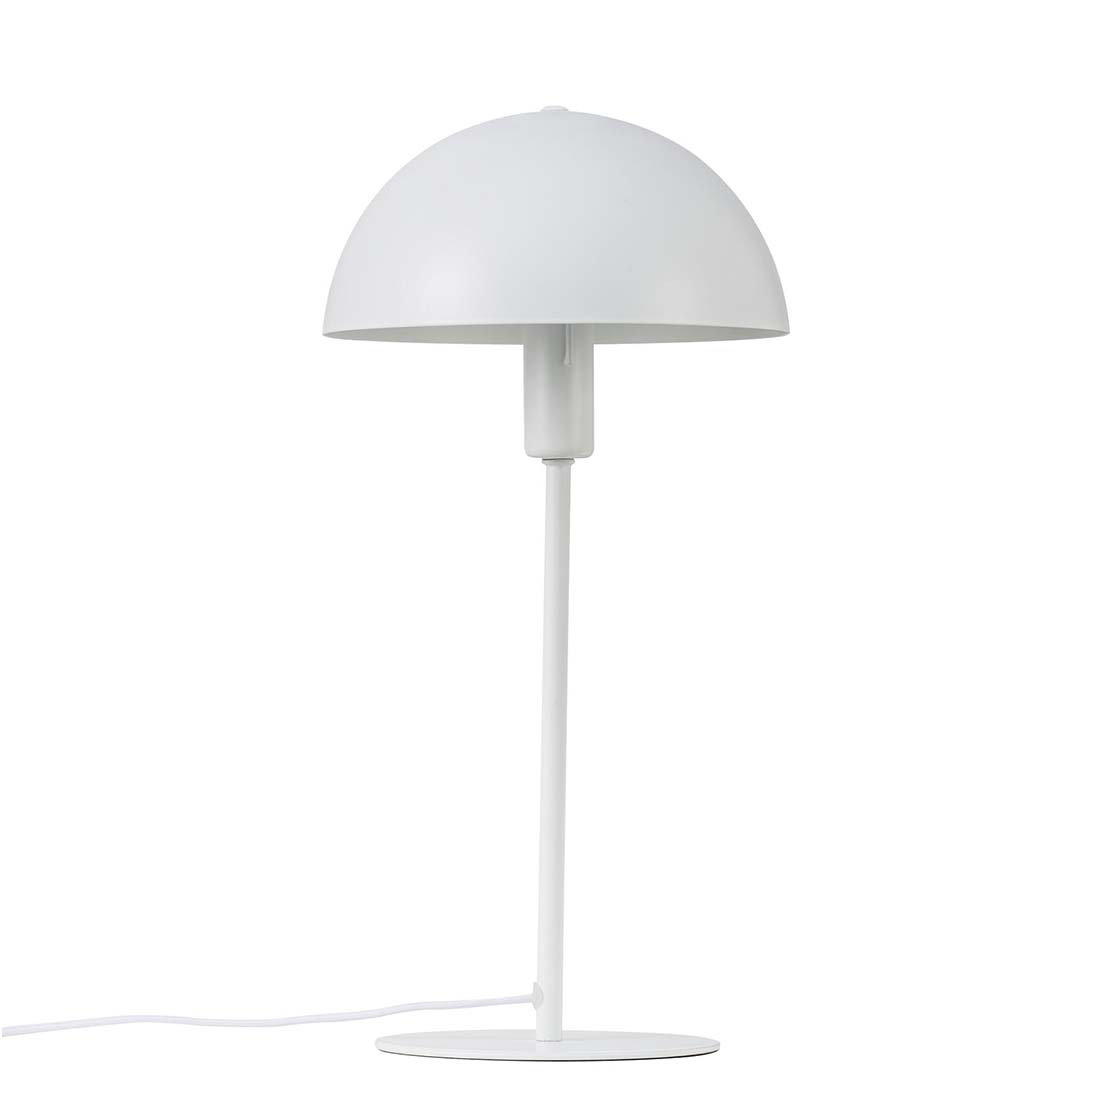 Helt nya Bordslampor - Köp bordslampa online | Lampan.se GP-31